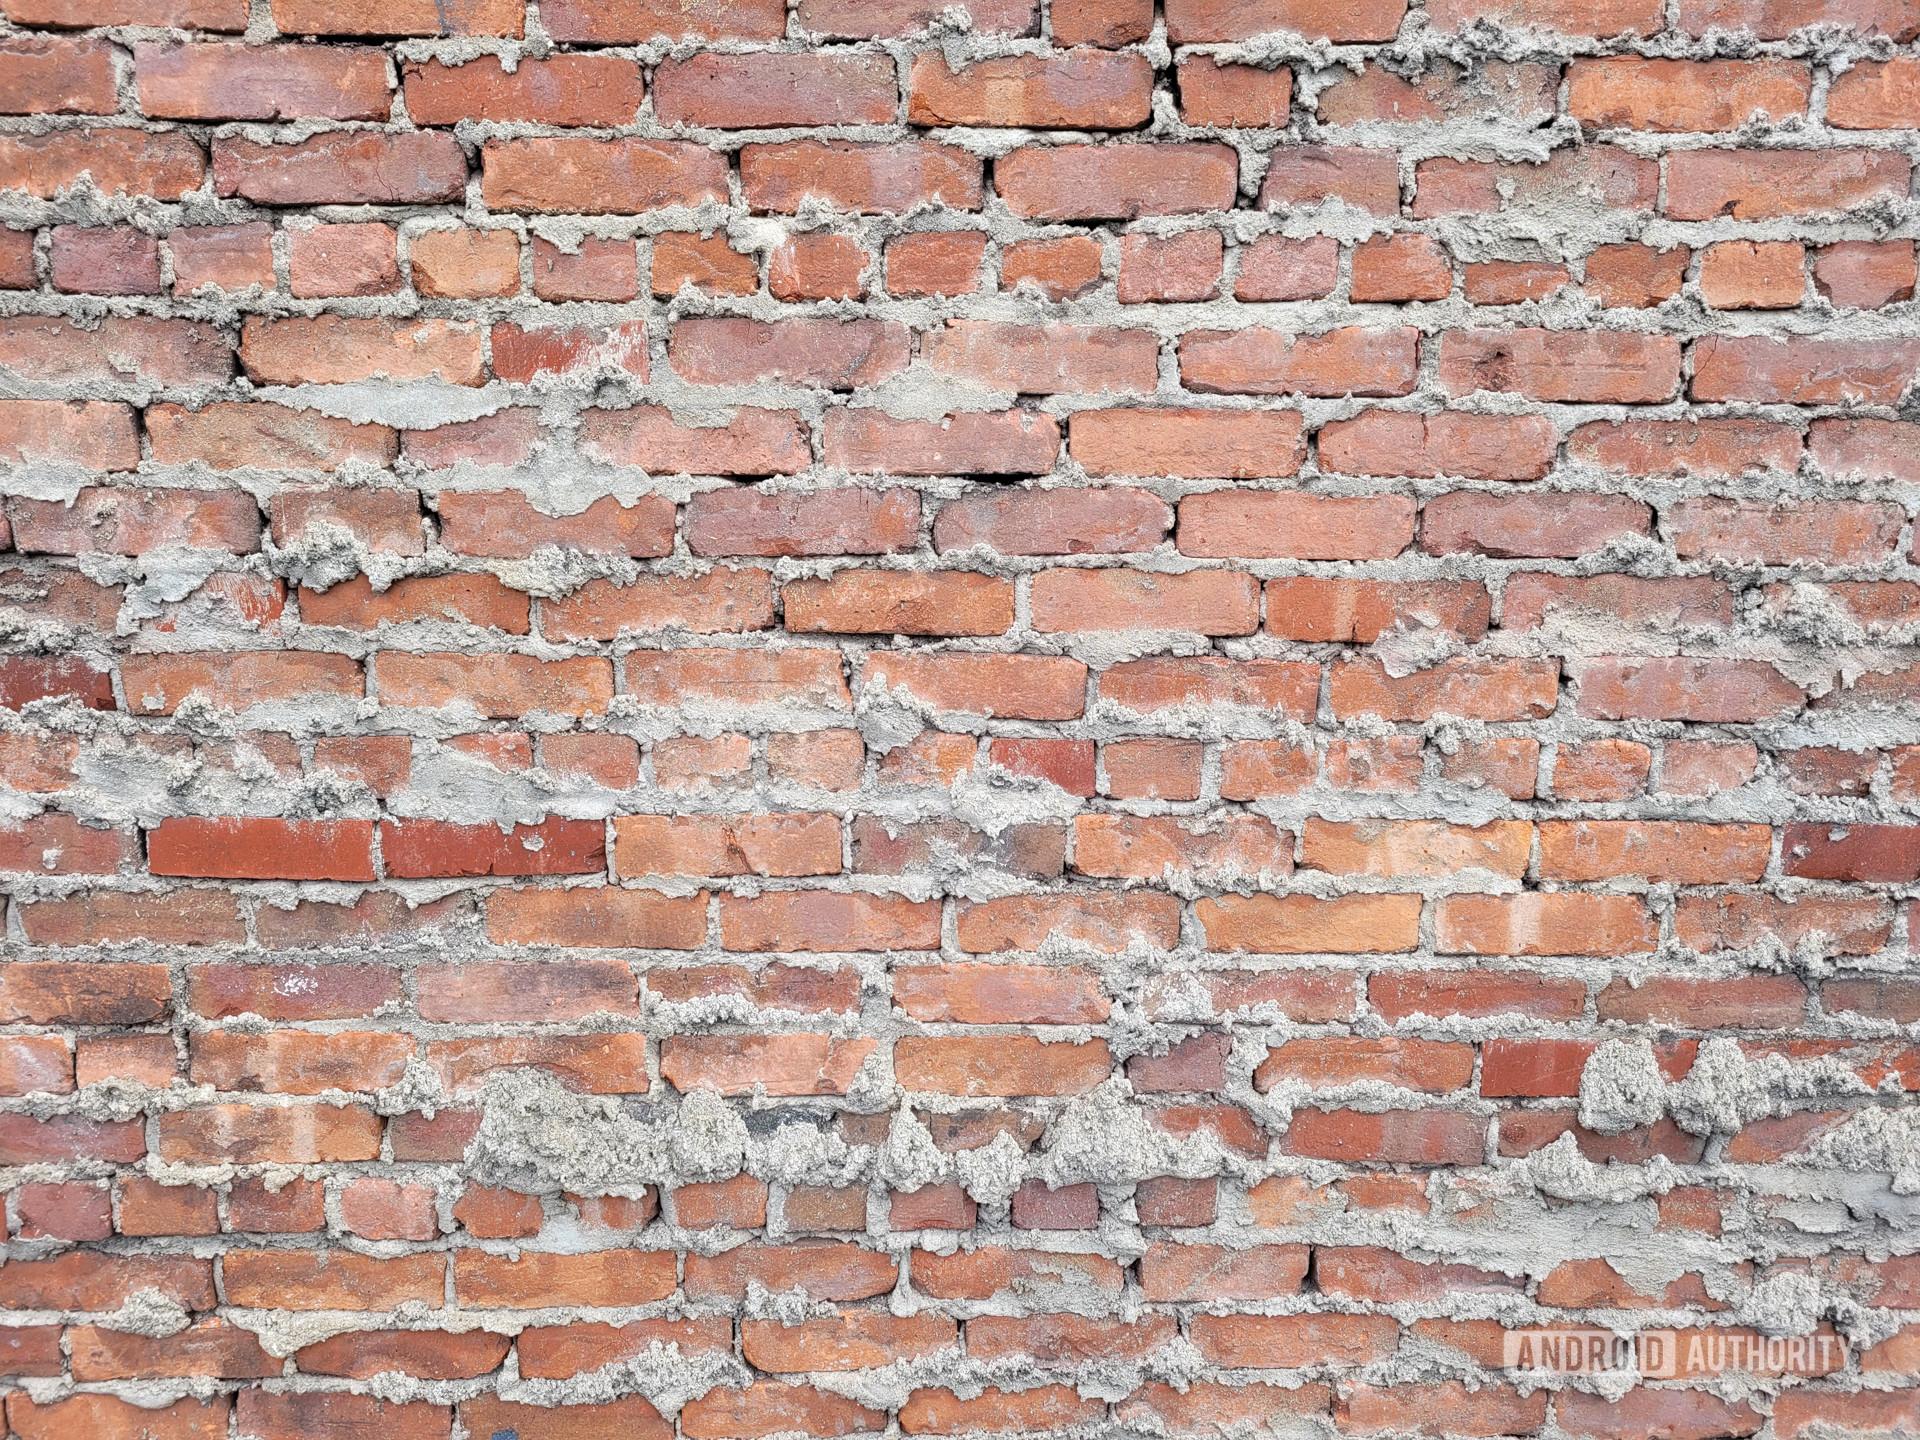 Samsung Galaxy S20 FE photo sample brick wall